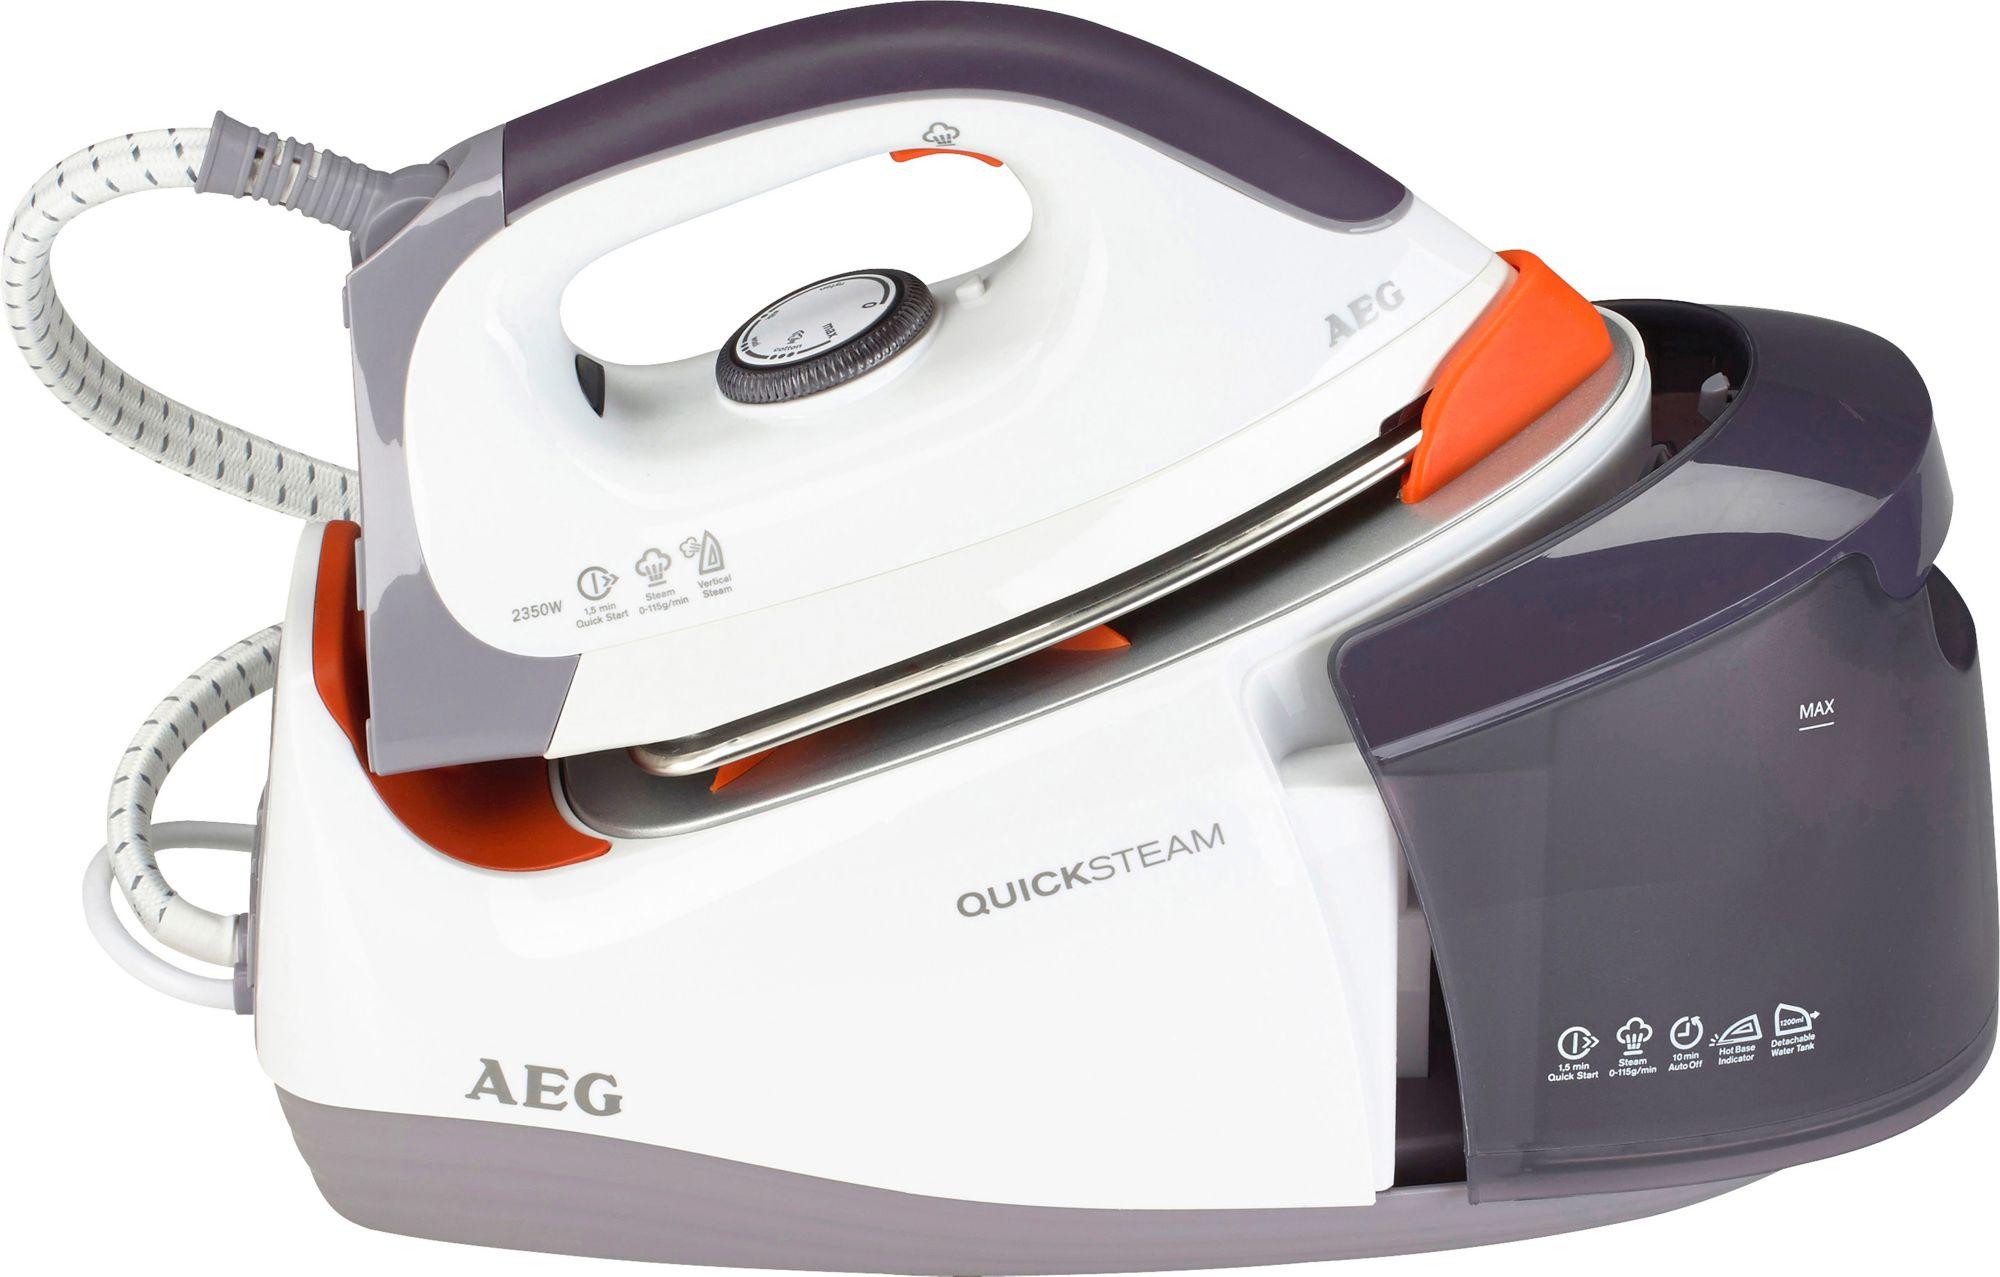 aeg dampfb gelstation quicksteam dbs 3350 2350 watt. Black Bedroom Furniture Sets. Home Design Ideas